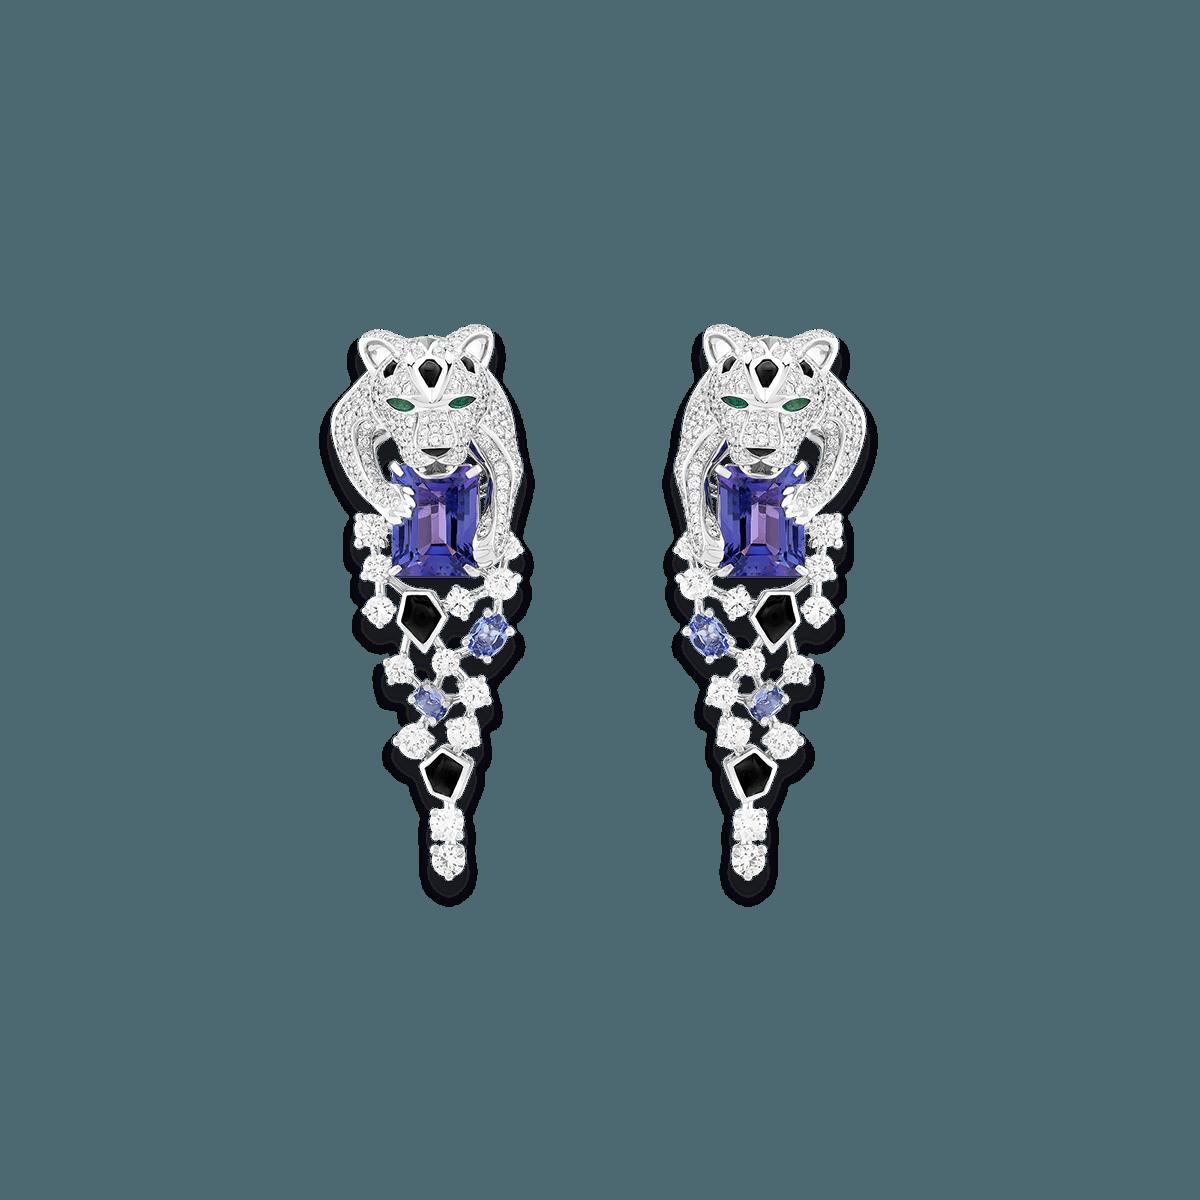 Sartoro FAUNA - SNOW LEOPARD Earrings SLEO-E4WGTZON